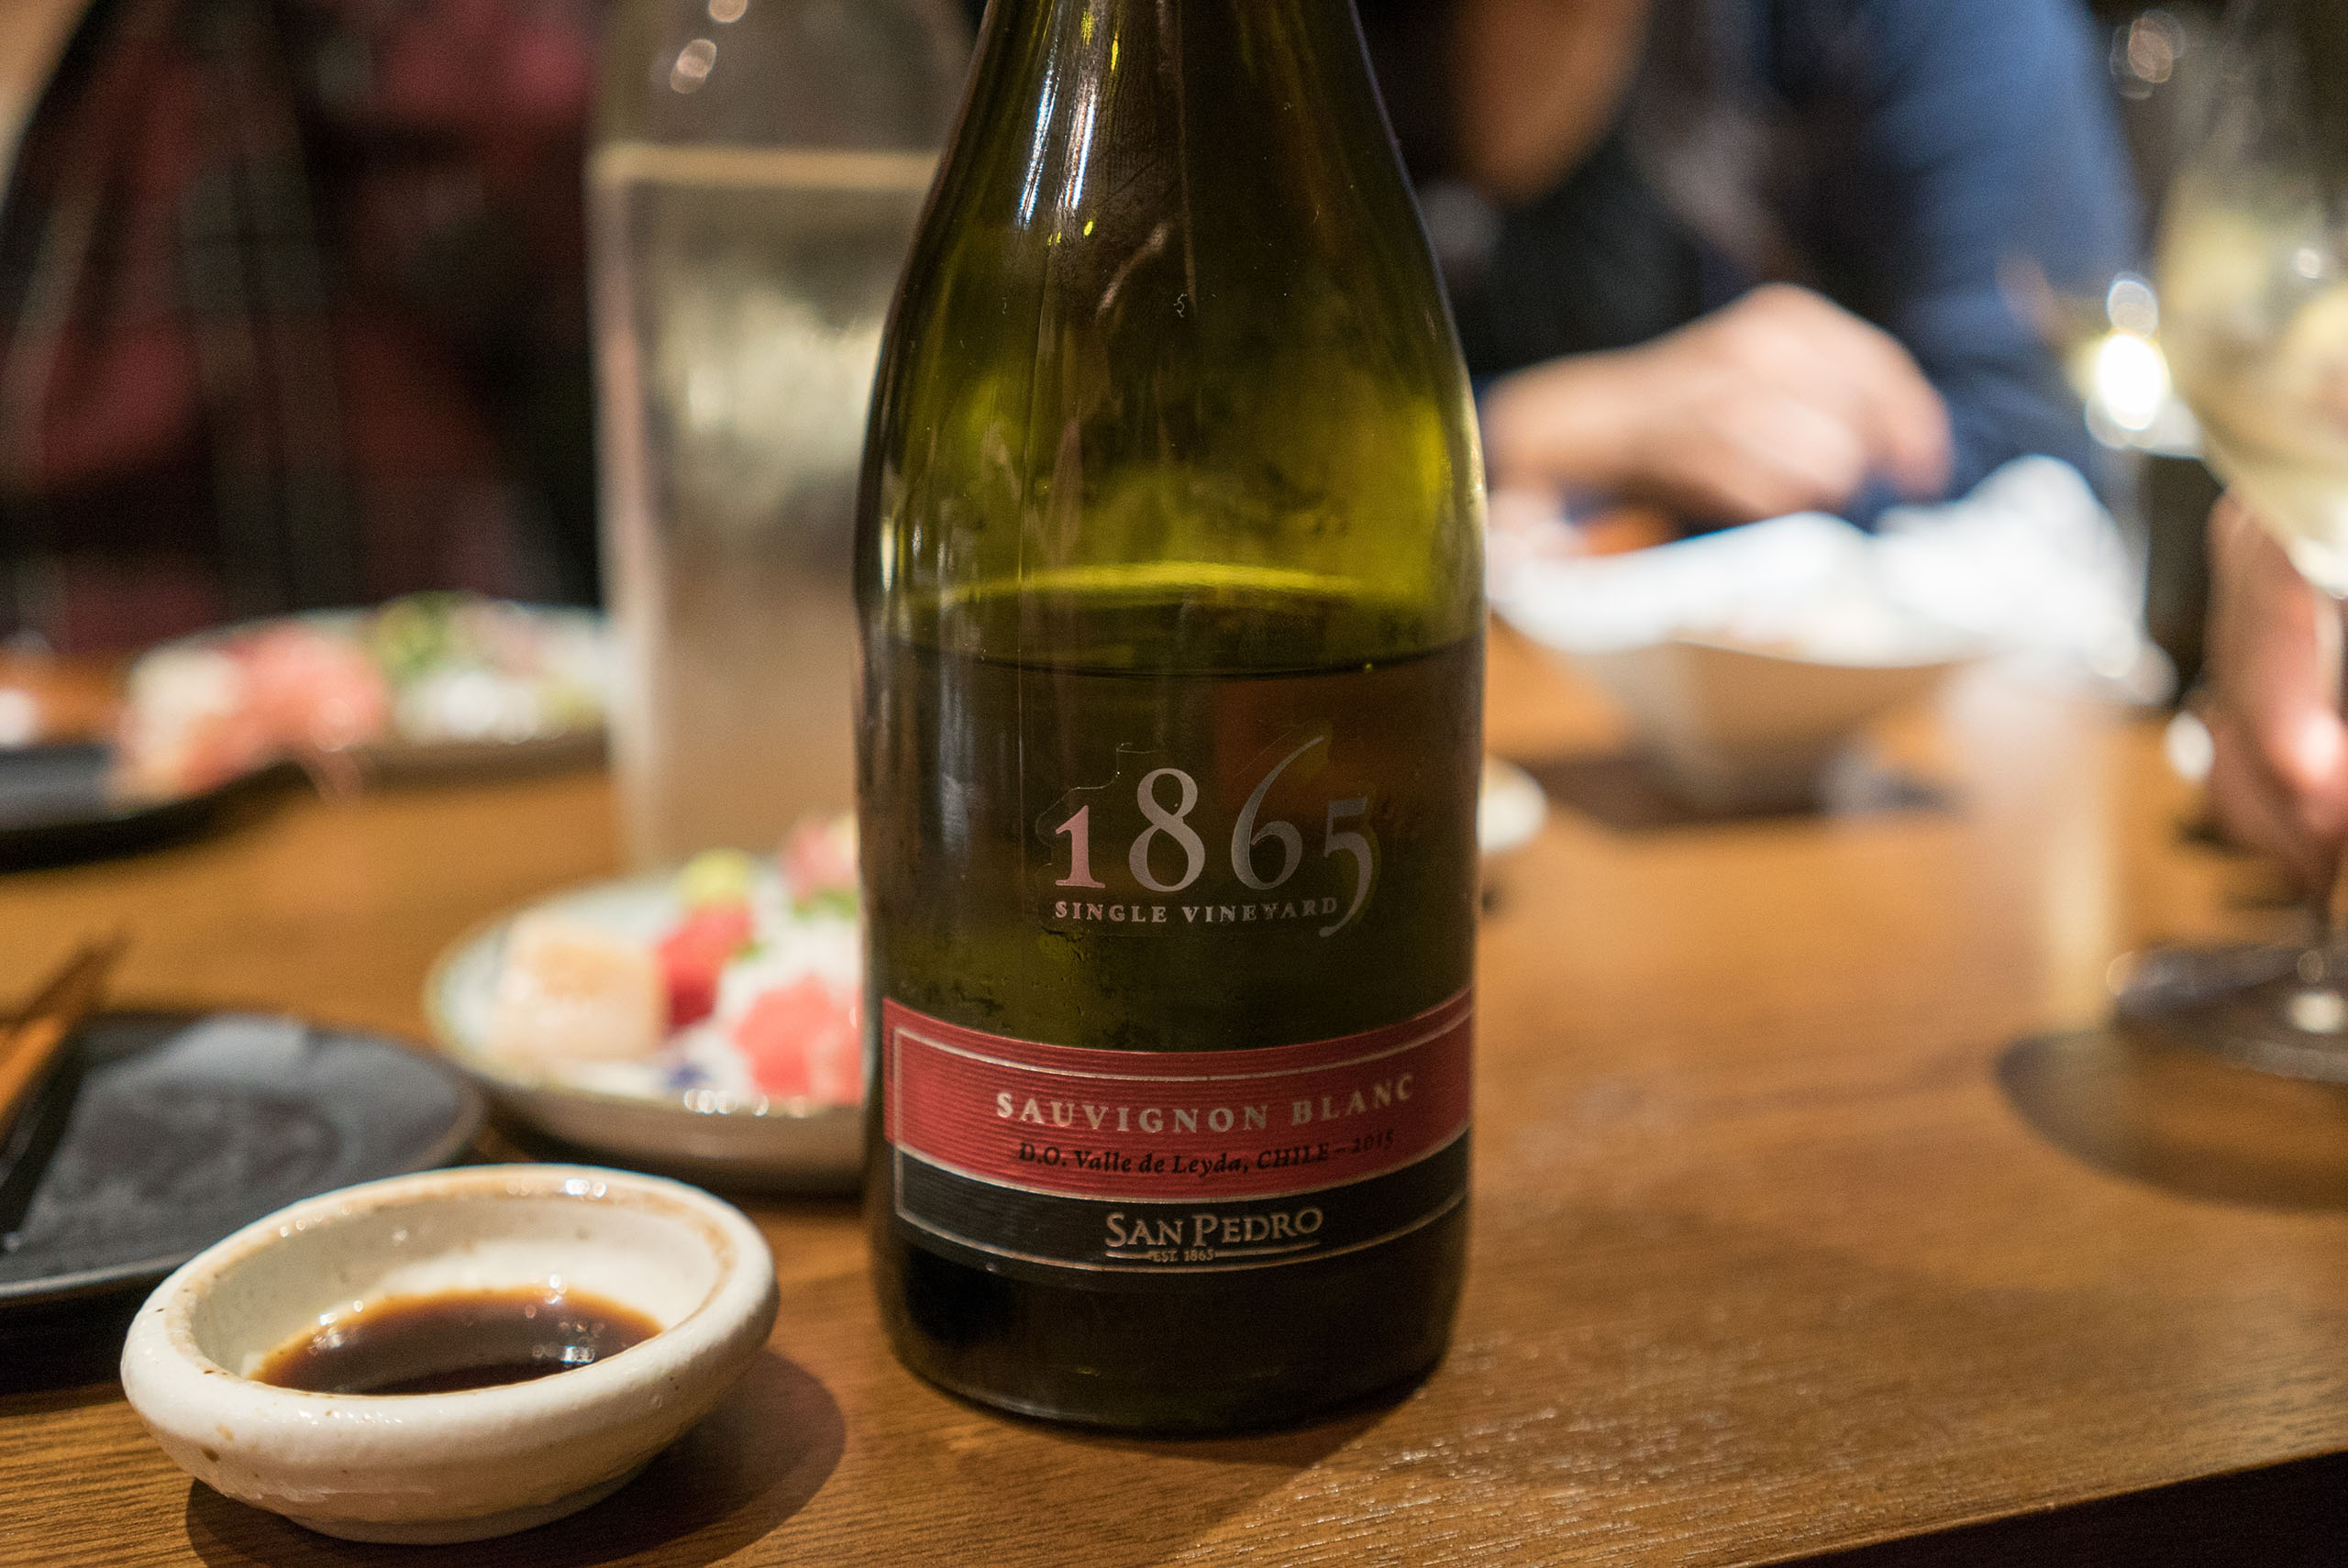 San Pedro 1865 Single Vineyard Sauvignon Blanc